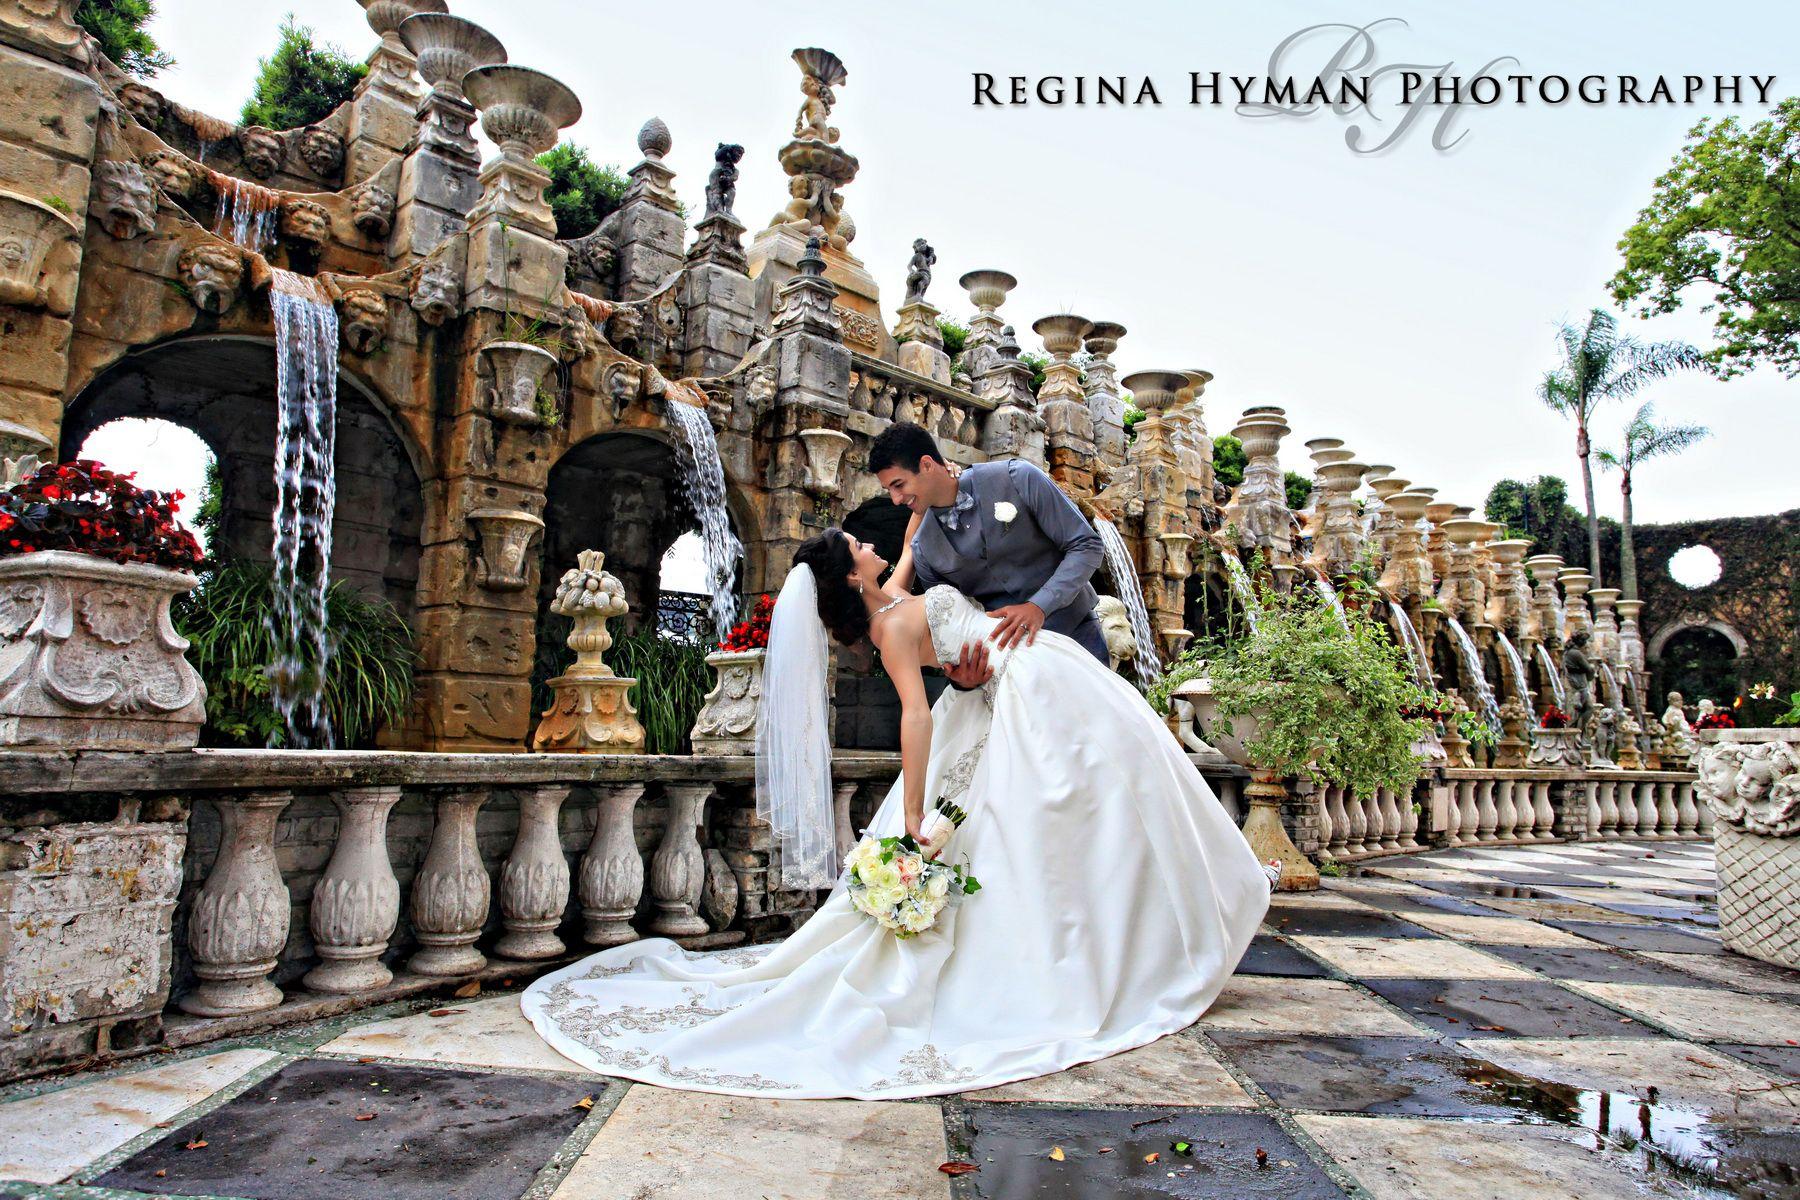 Kapok Tree Events Center Wedding Clearwater FL Orlando Photographer Regina Hyman